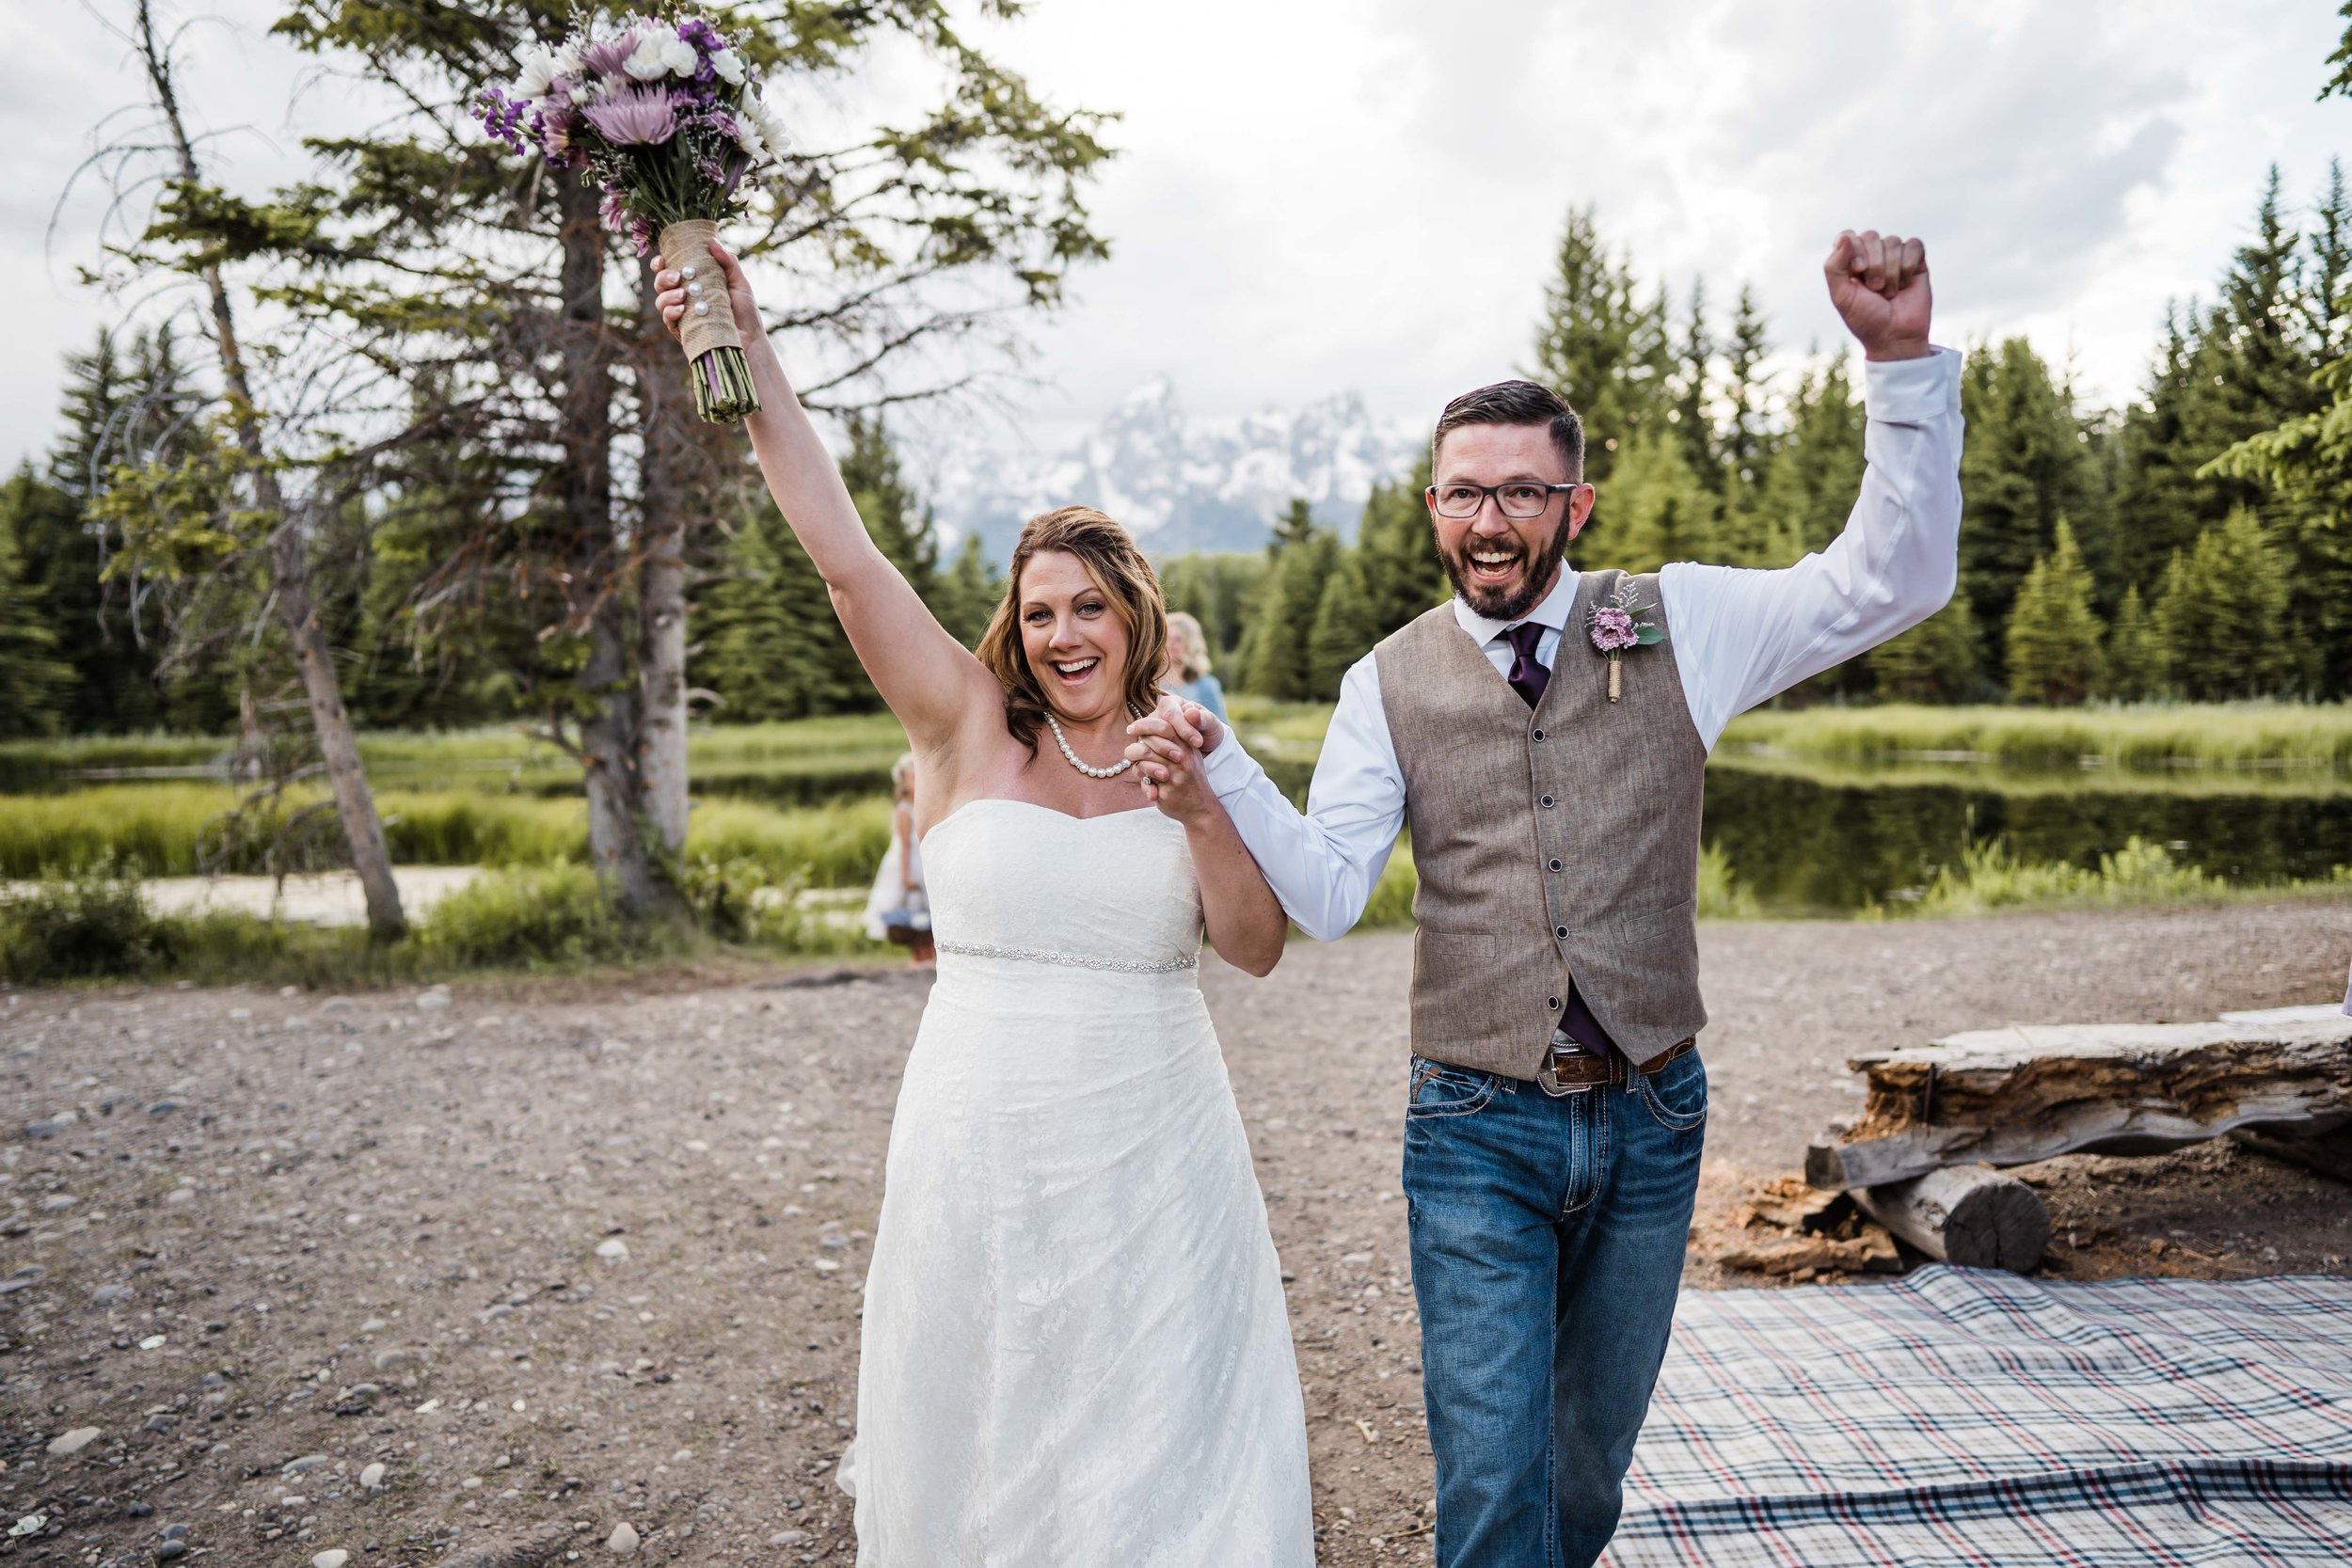 jackson hole adventure wedding photography at schwabachers landing in GTNP -DSD01655.jpg